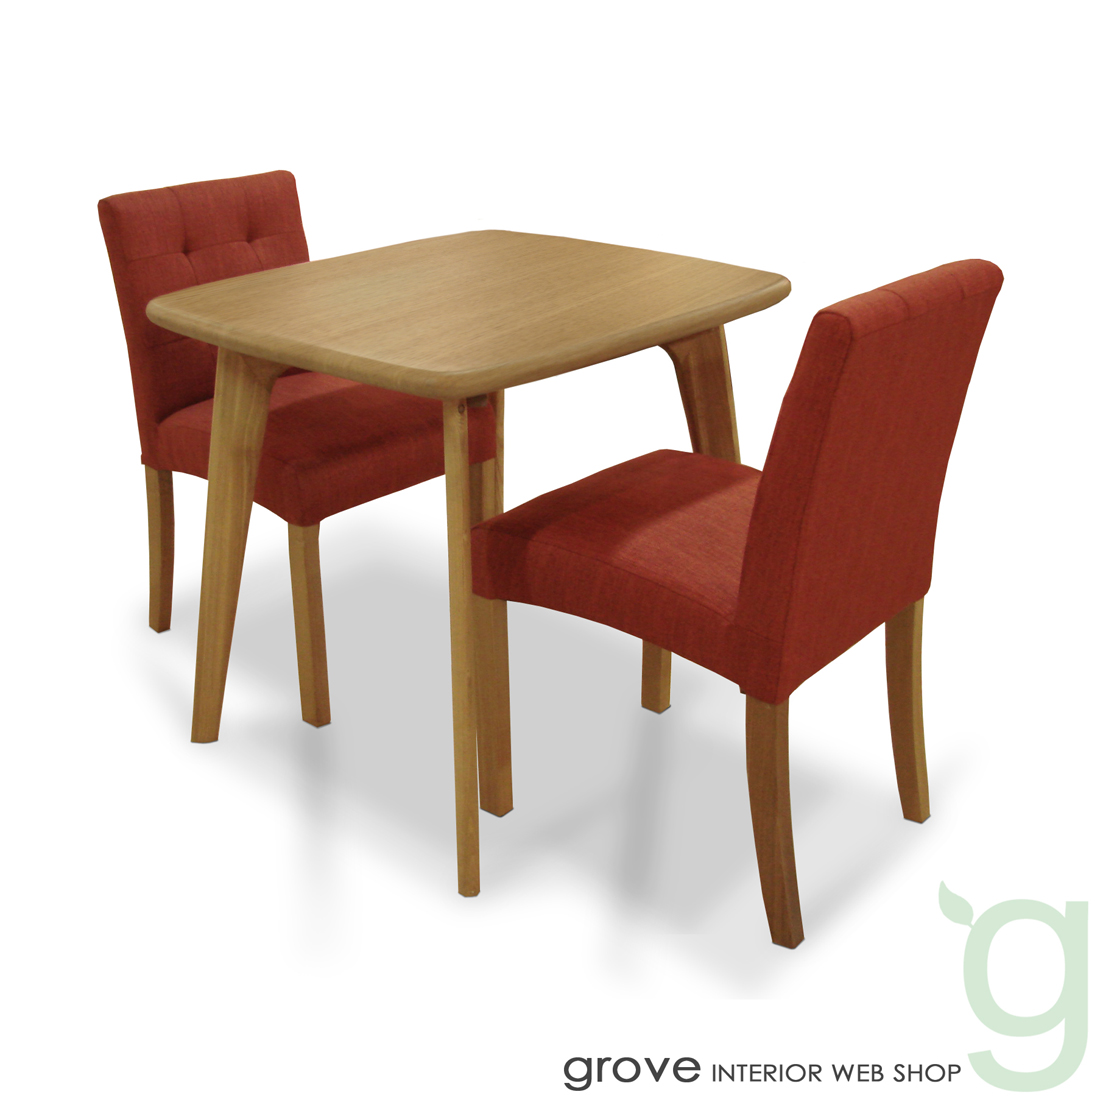 ■CL8 ダイニング3点セット■チェア張り地:レッド(赤)■テーブル幅80cmタイプ■送料無料■北欧家具 テイスト■北欧 モダン カントリー■木製テーブル 椅子 チェアー■リビングダイニング■食卓セット 食卓椅子 食卓テーブル